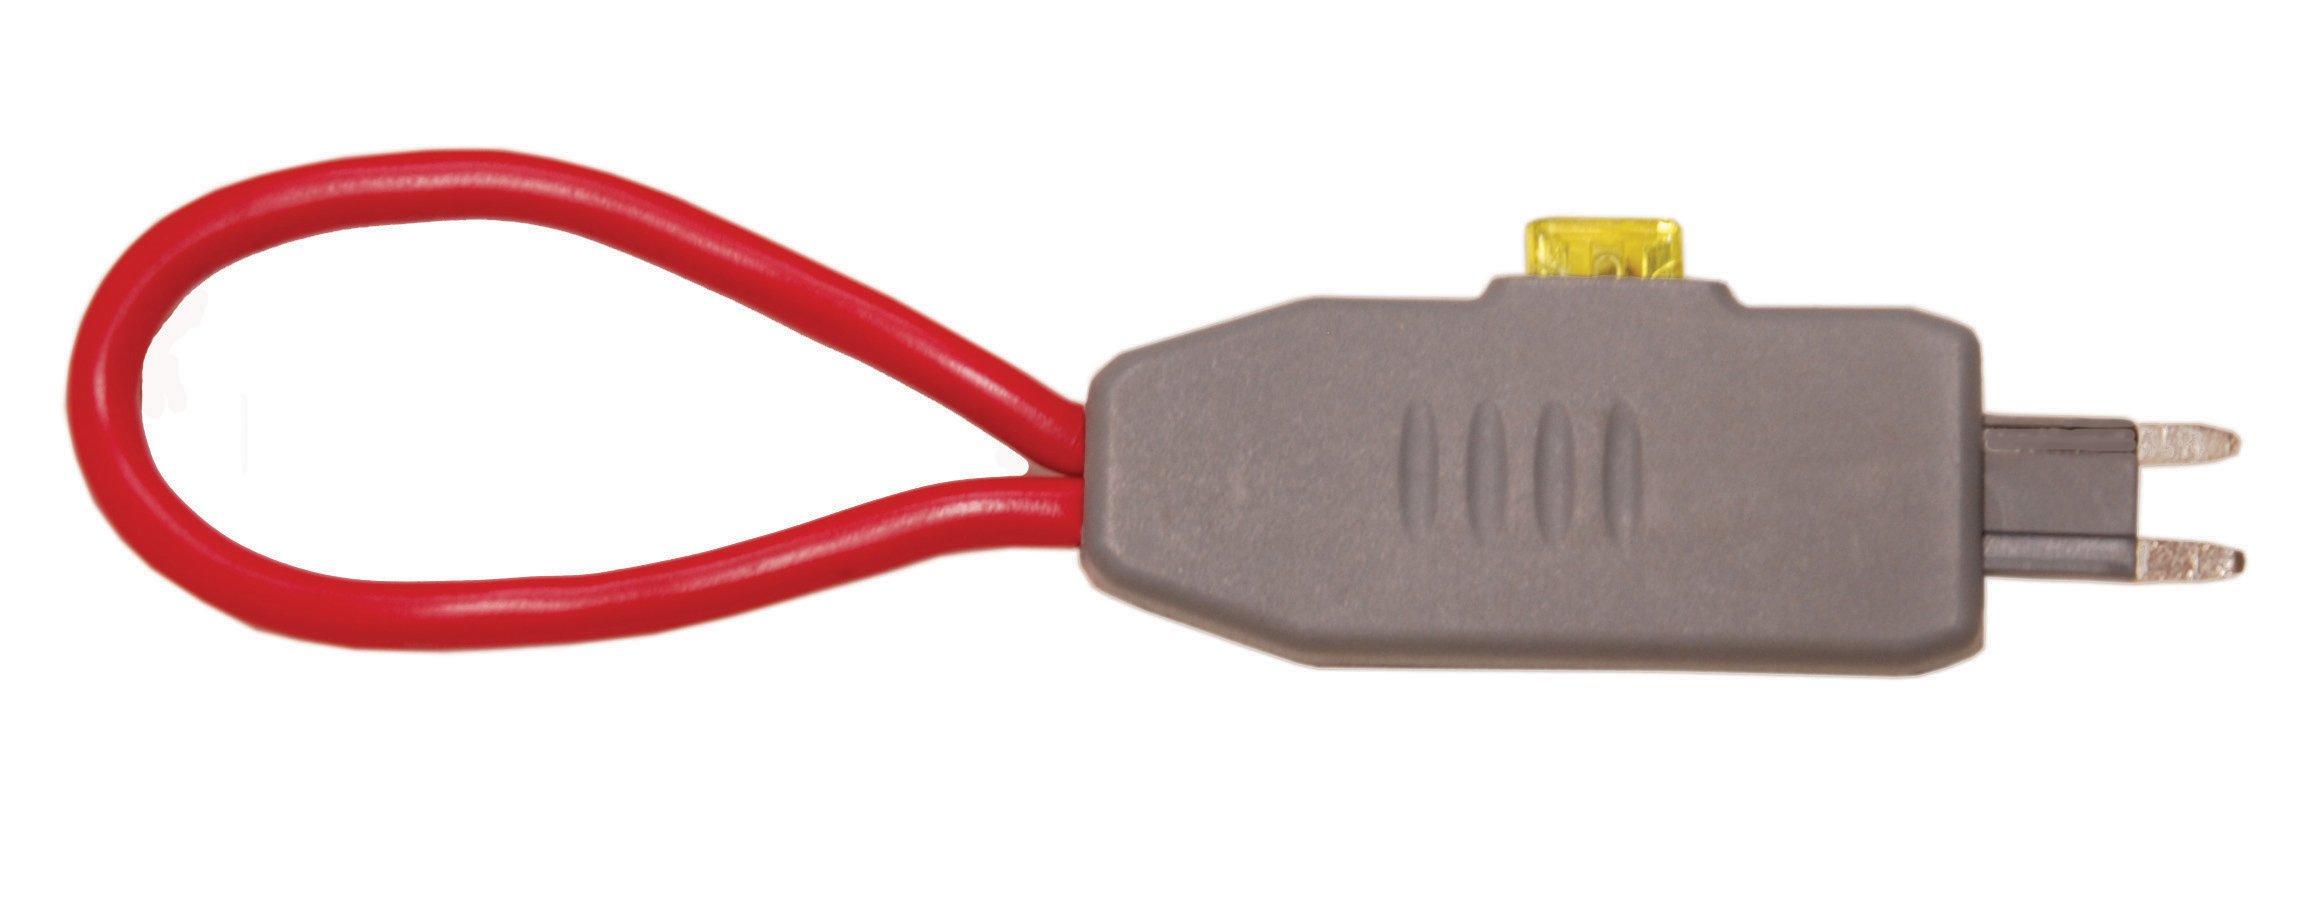 Electronic Specialties ESI 307M Fuse Buddy Mini Current Loop